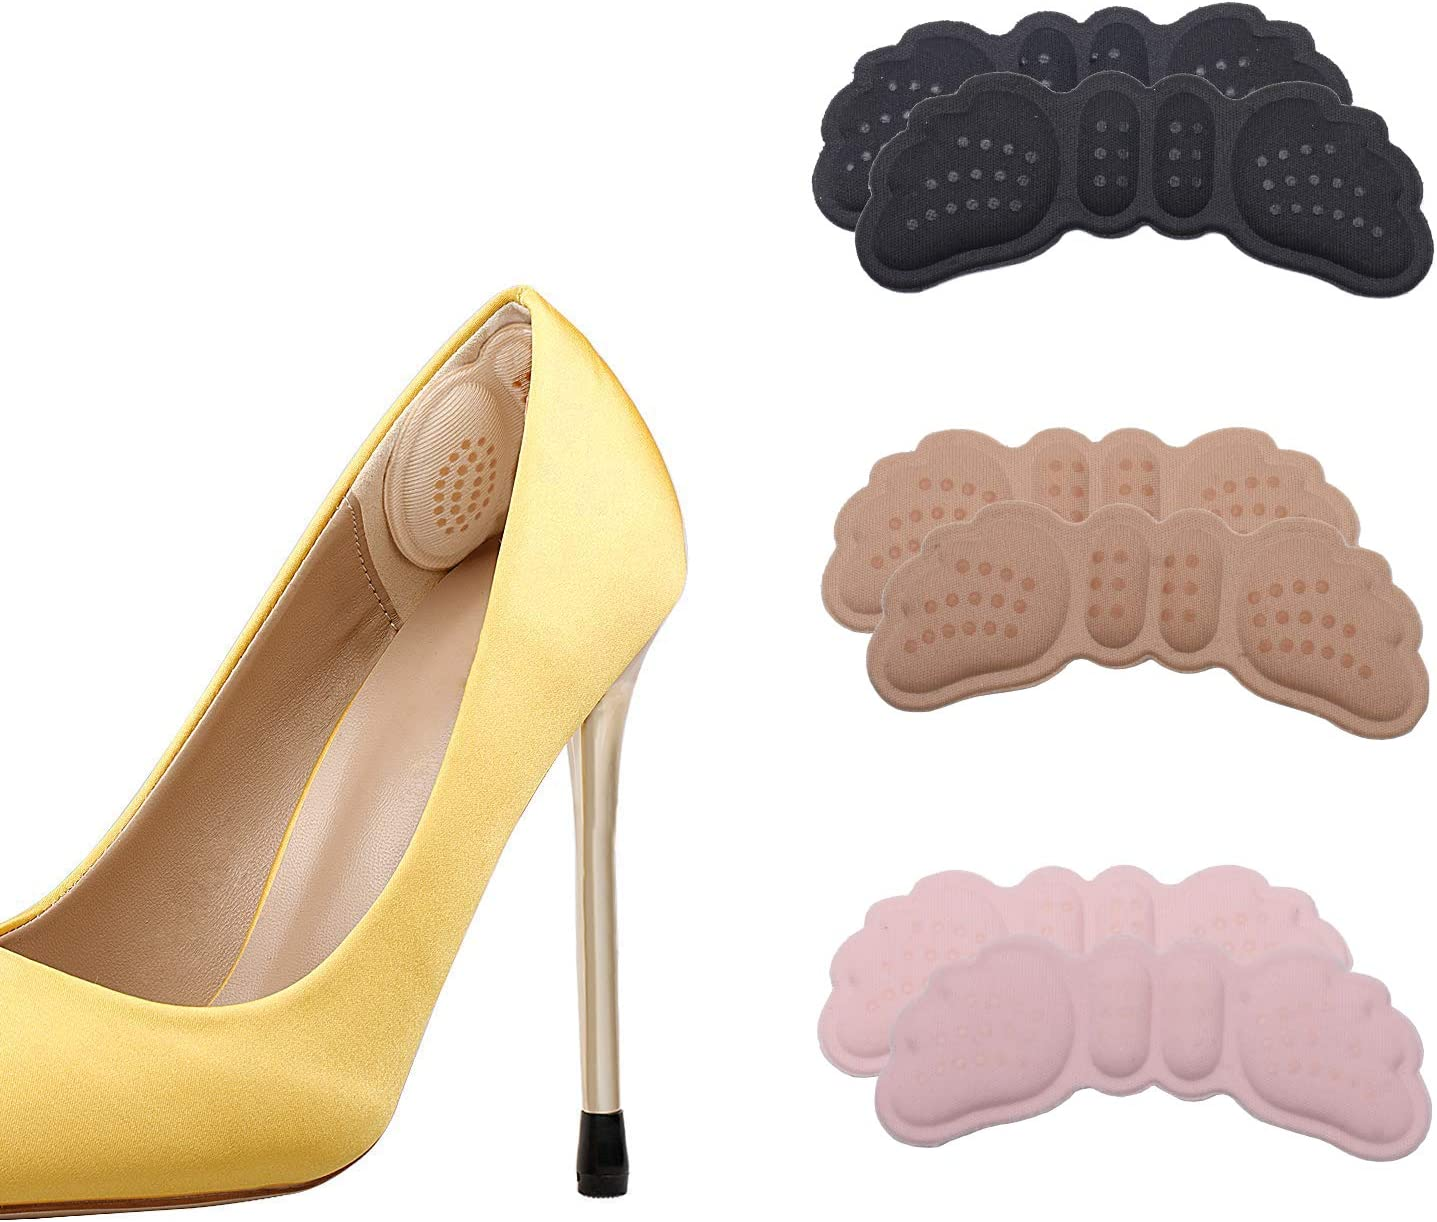 SooGree 3 Pairs Heel Cushion Inserts Men Grips Ki Sales results No. 1 Women for Under blast sales